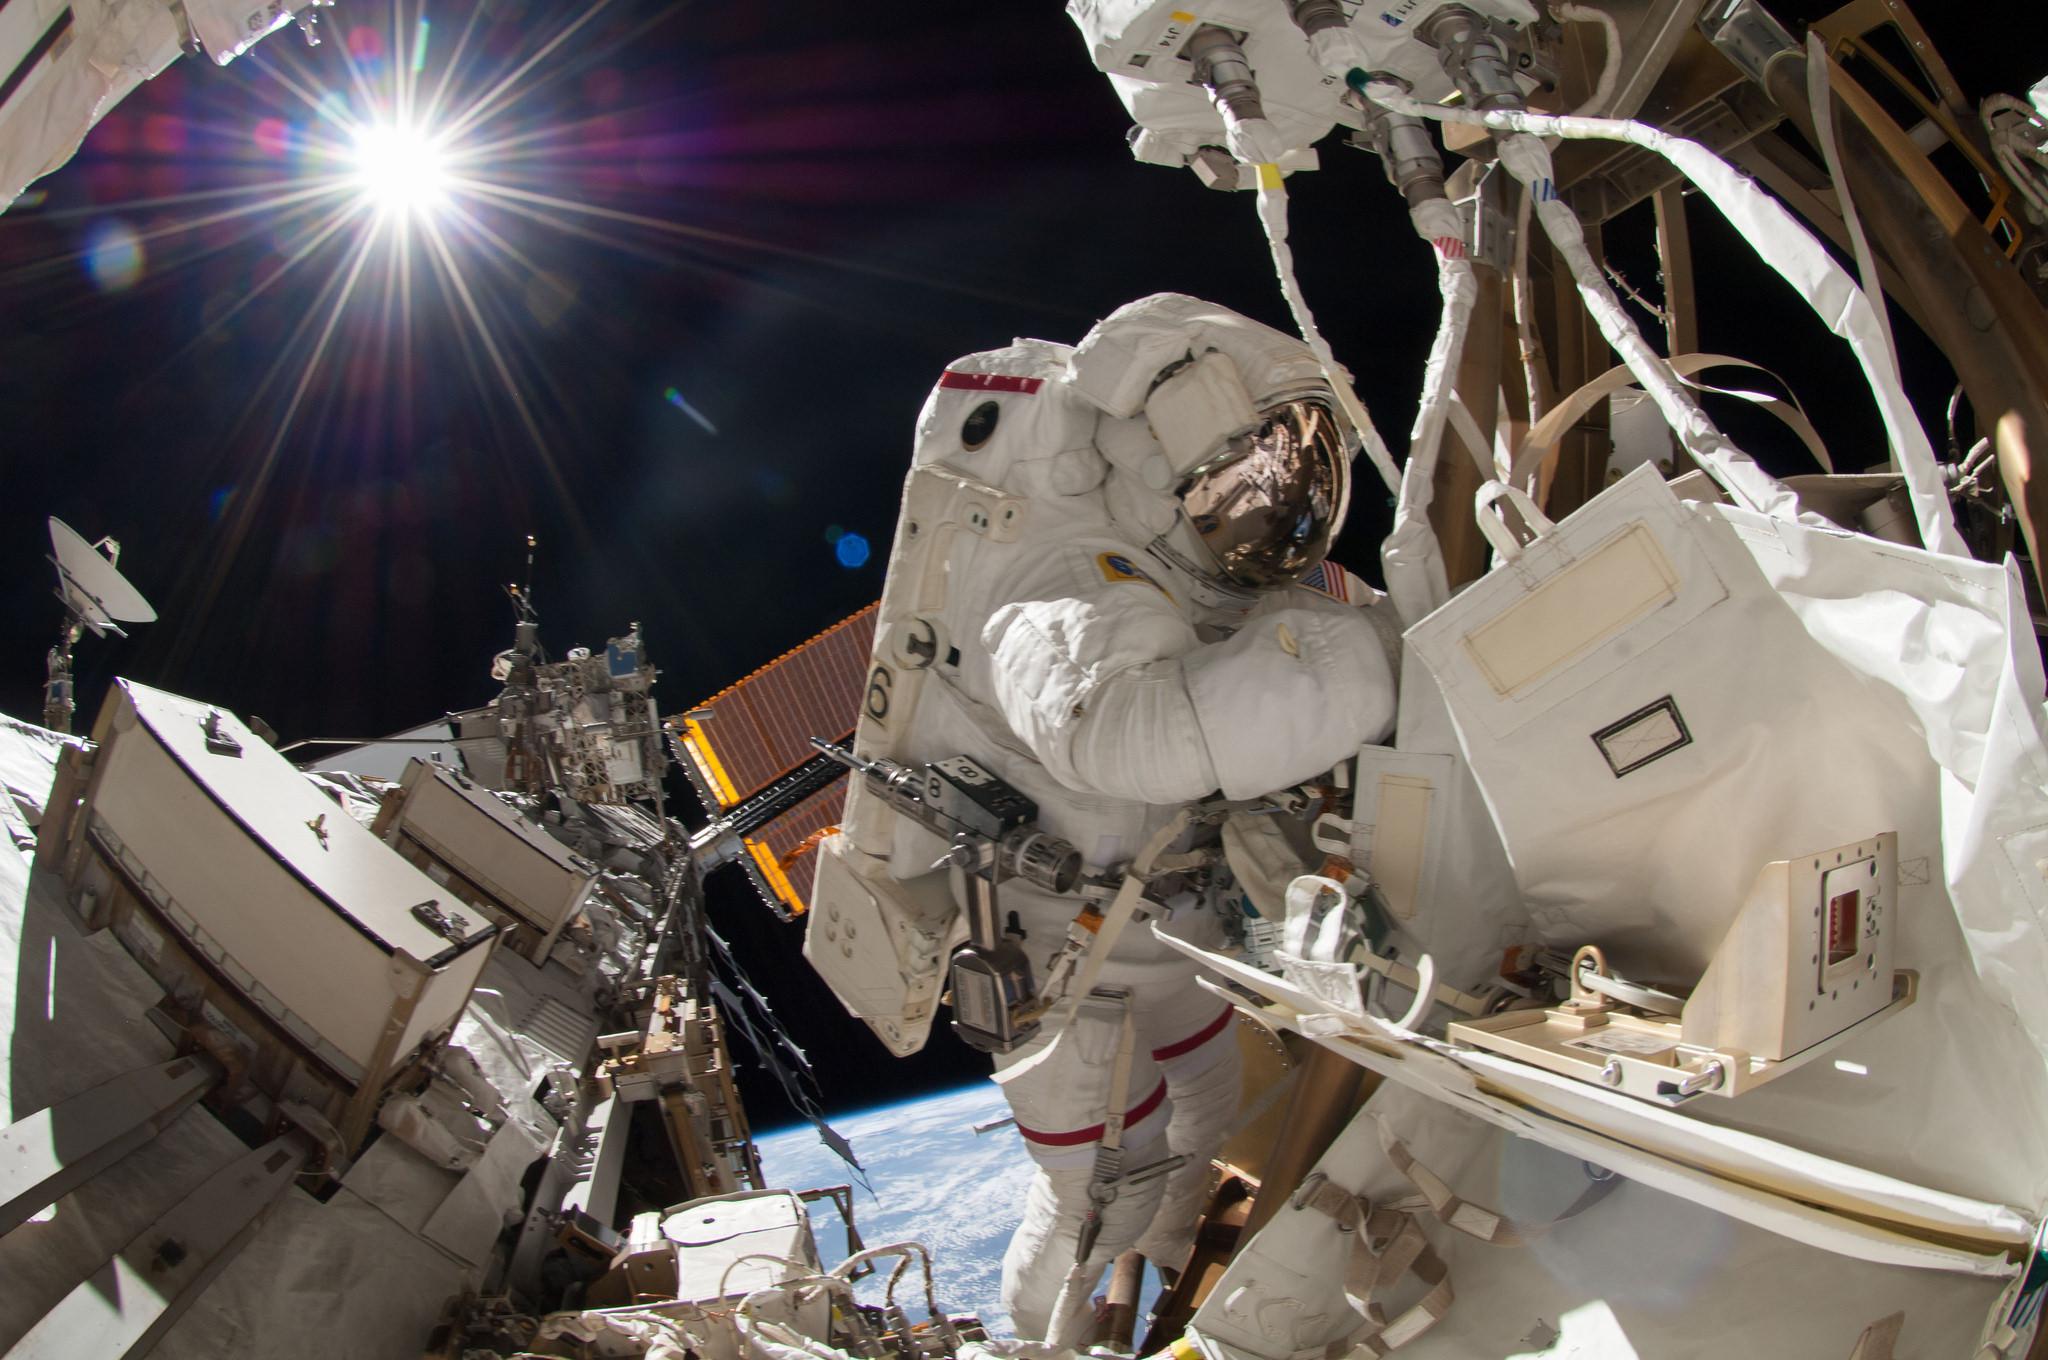 Expedition 41 Update: Oct. 9, 2014   NASA